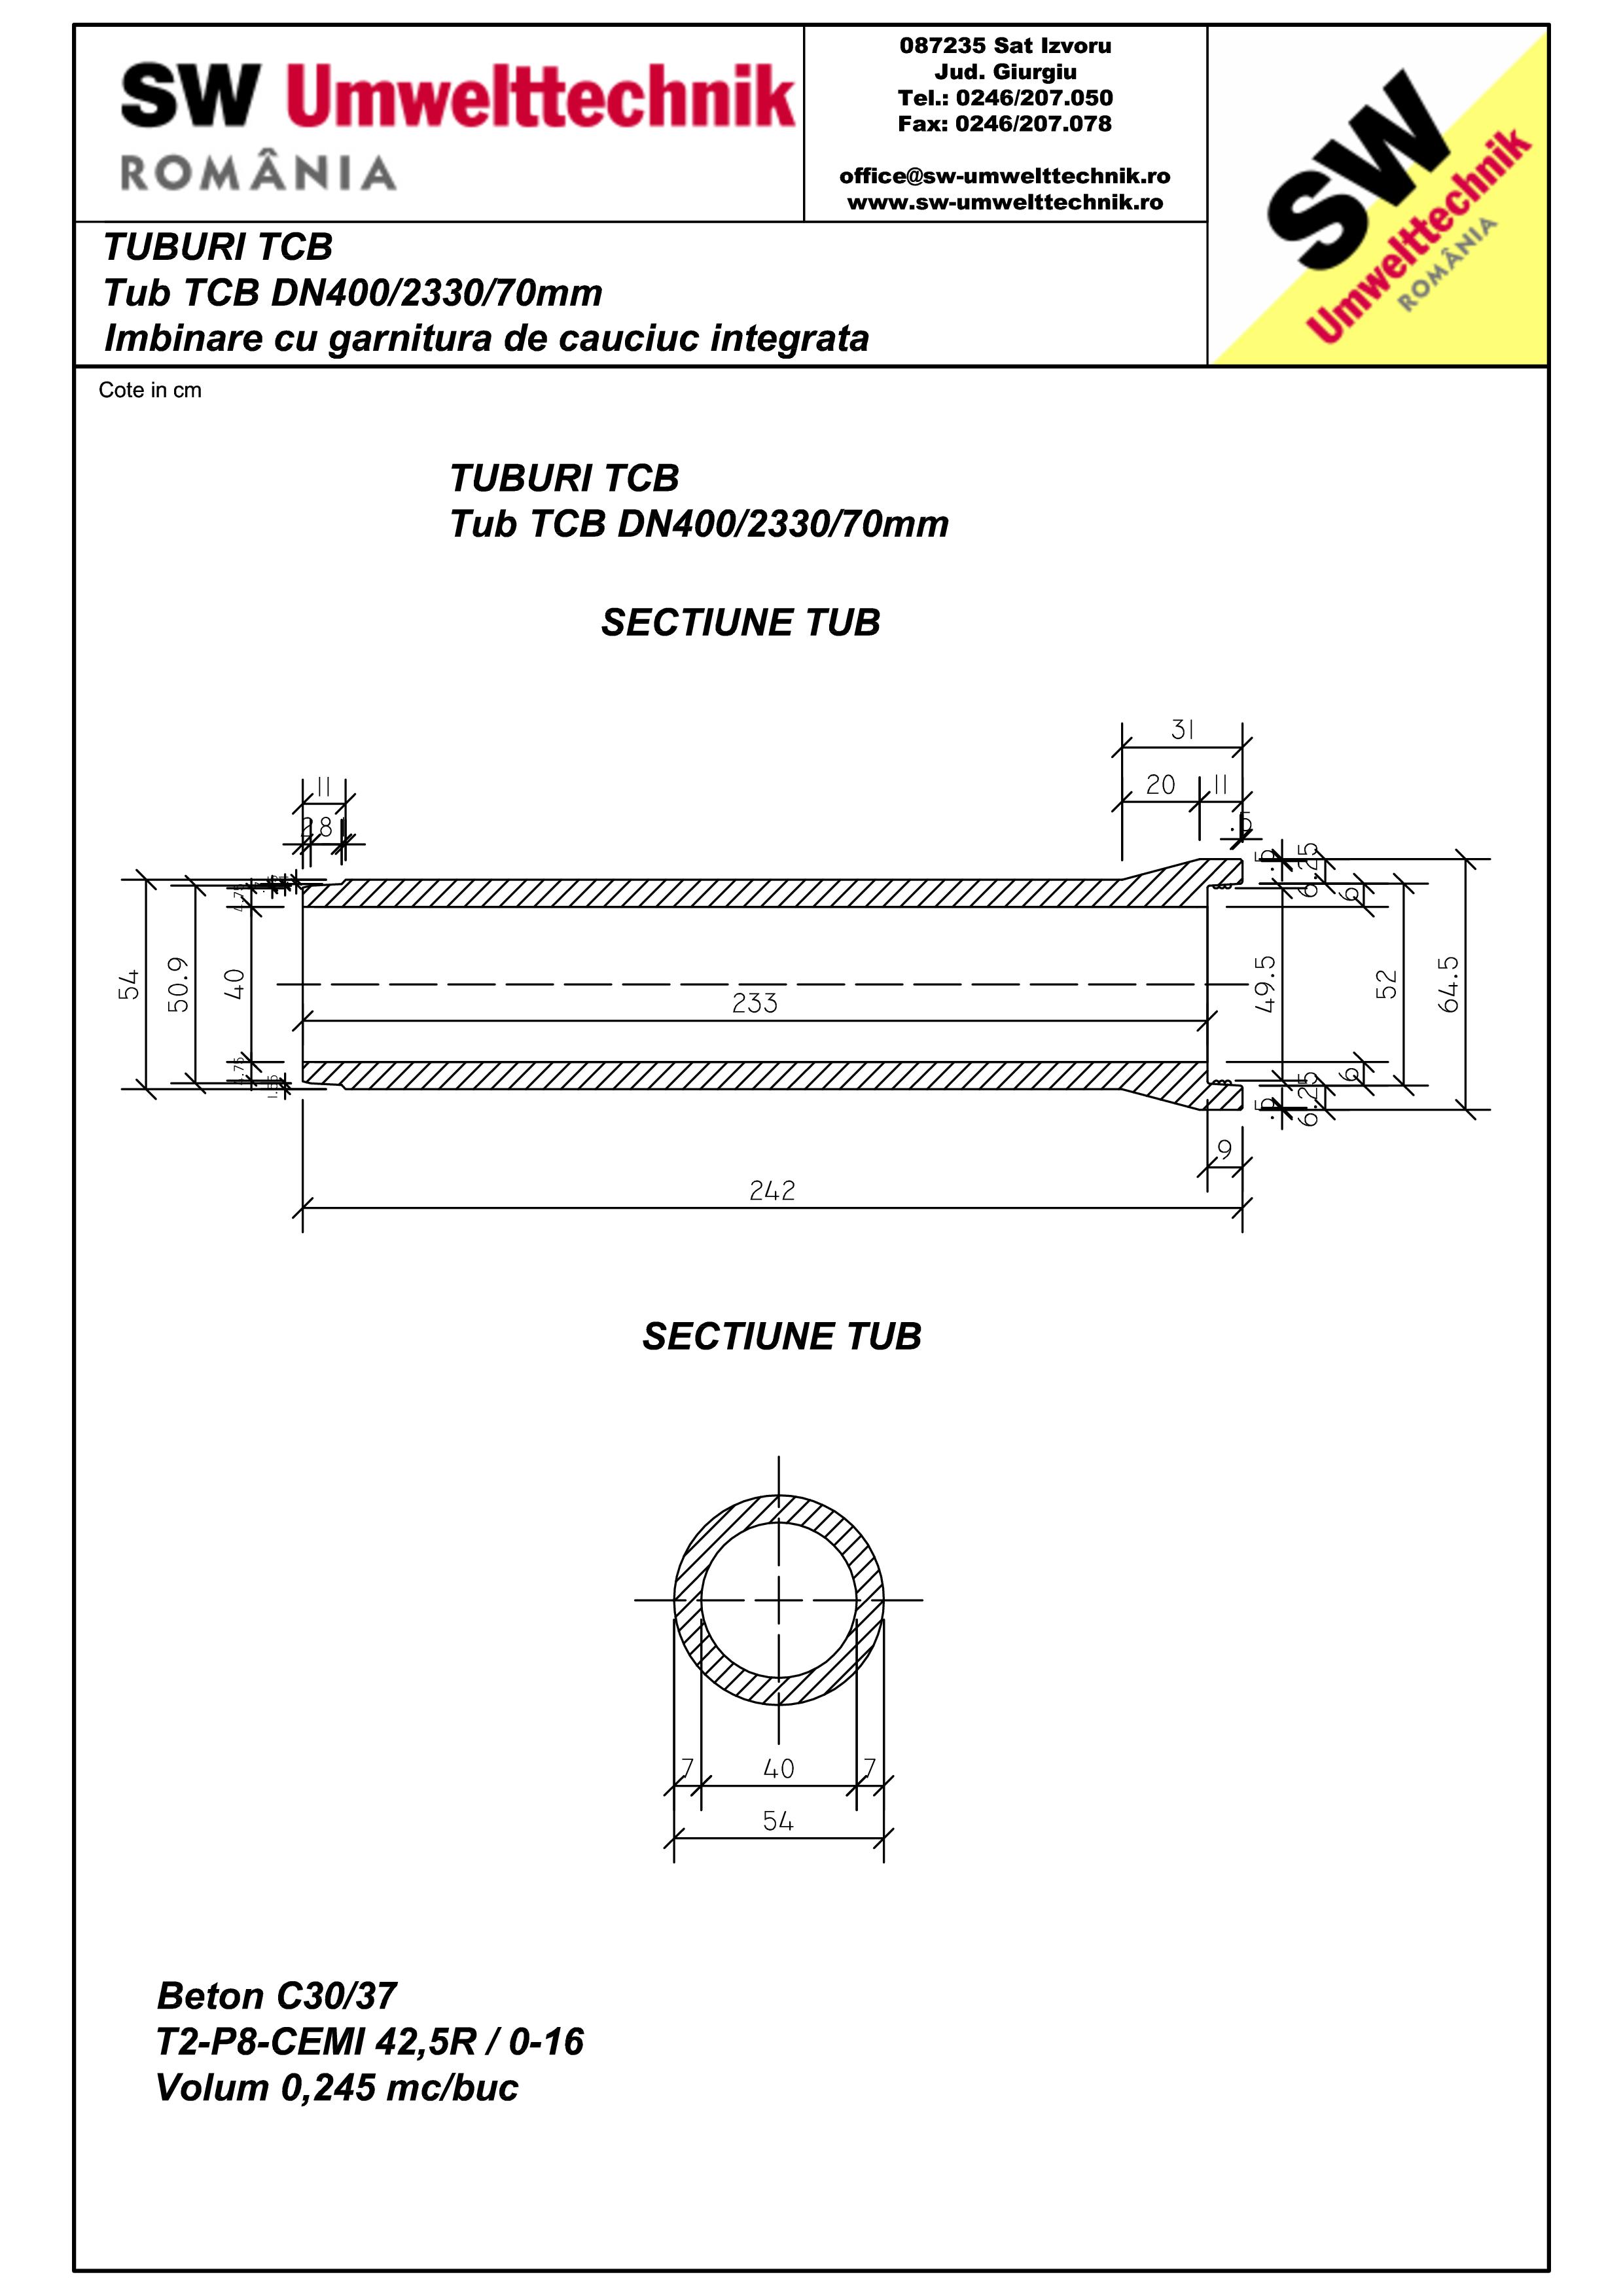 Pagina 1 - CAD-PDF Tub TCB DN400 L2,3m SW UMWELTTECHNIK Detaliu de produs